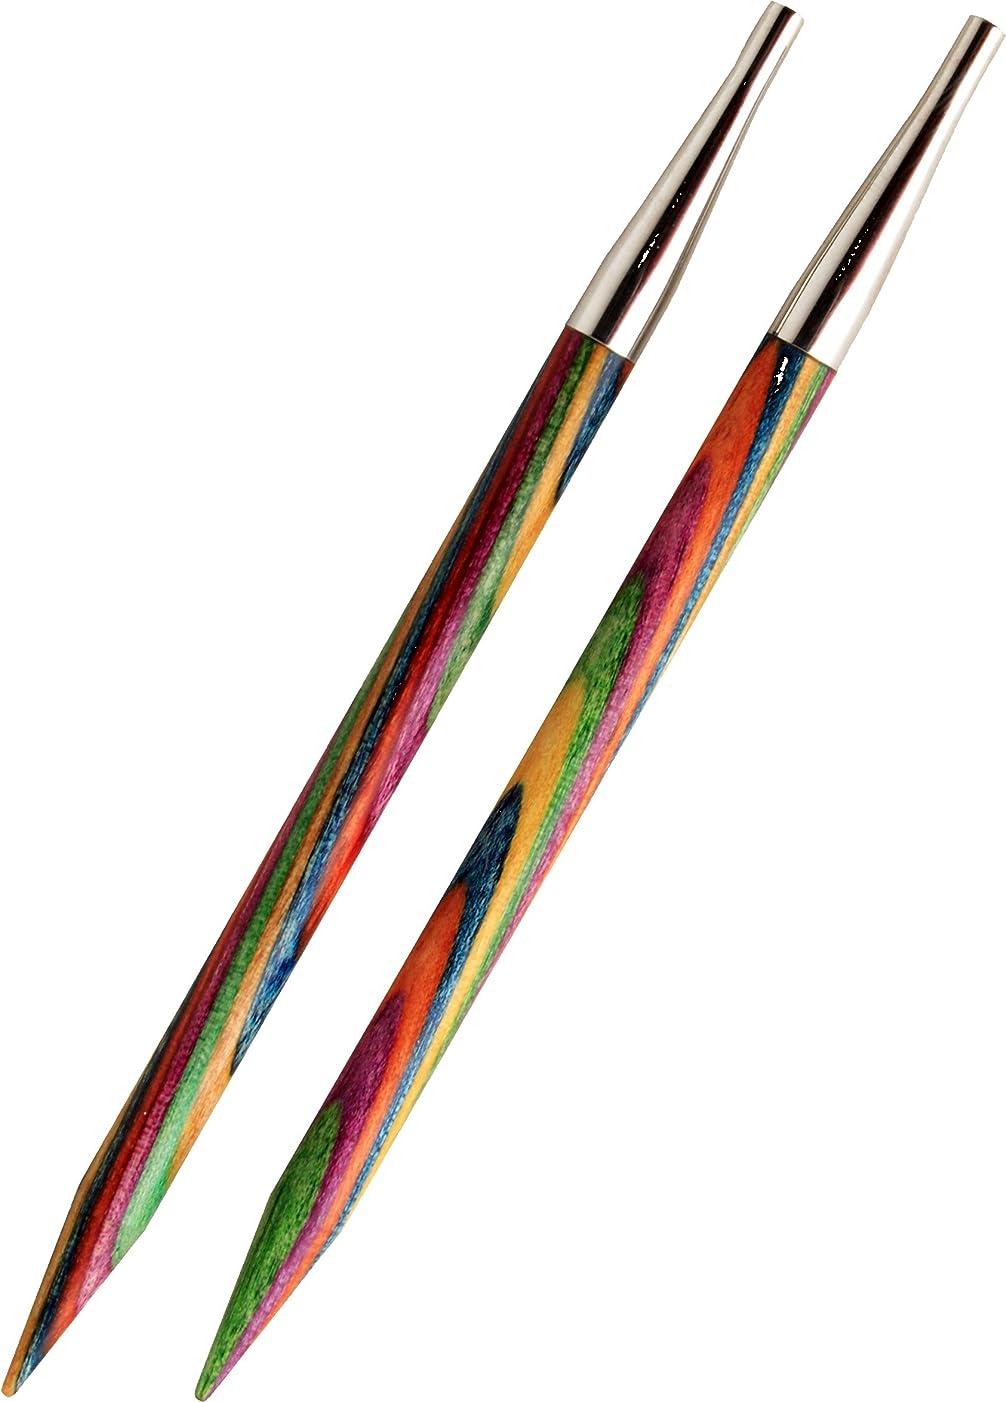 KnitPro 5 mm Symfonie Interchangeable Normal Circular Needles, Multi-Color